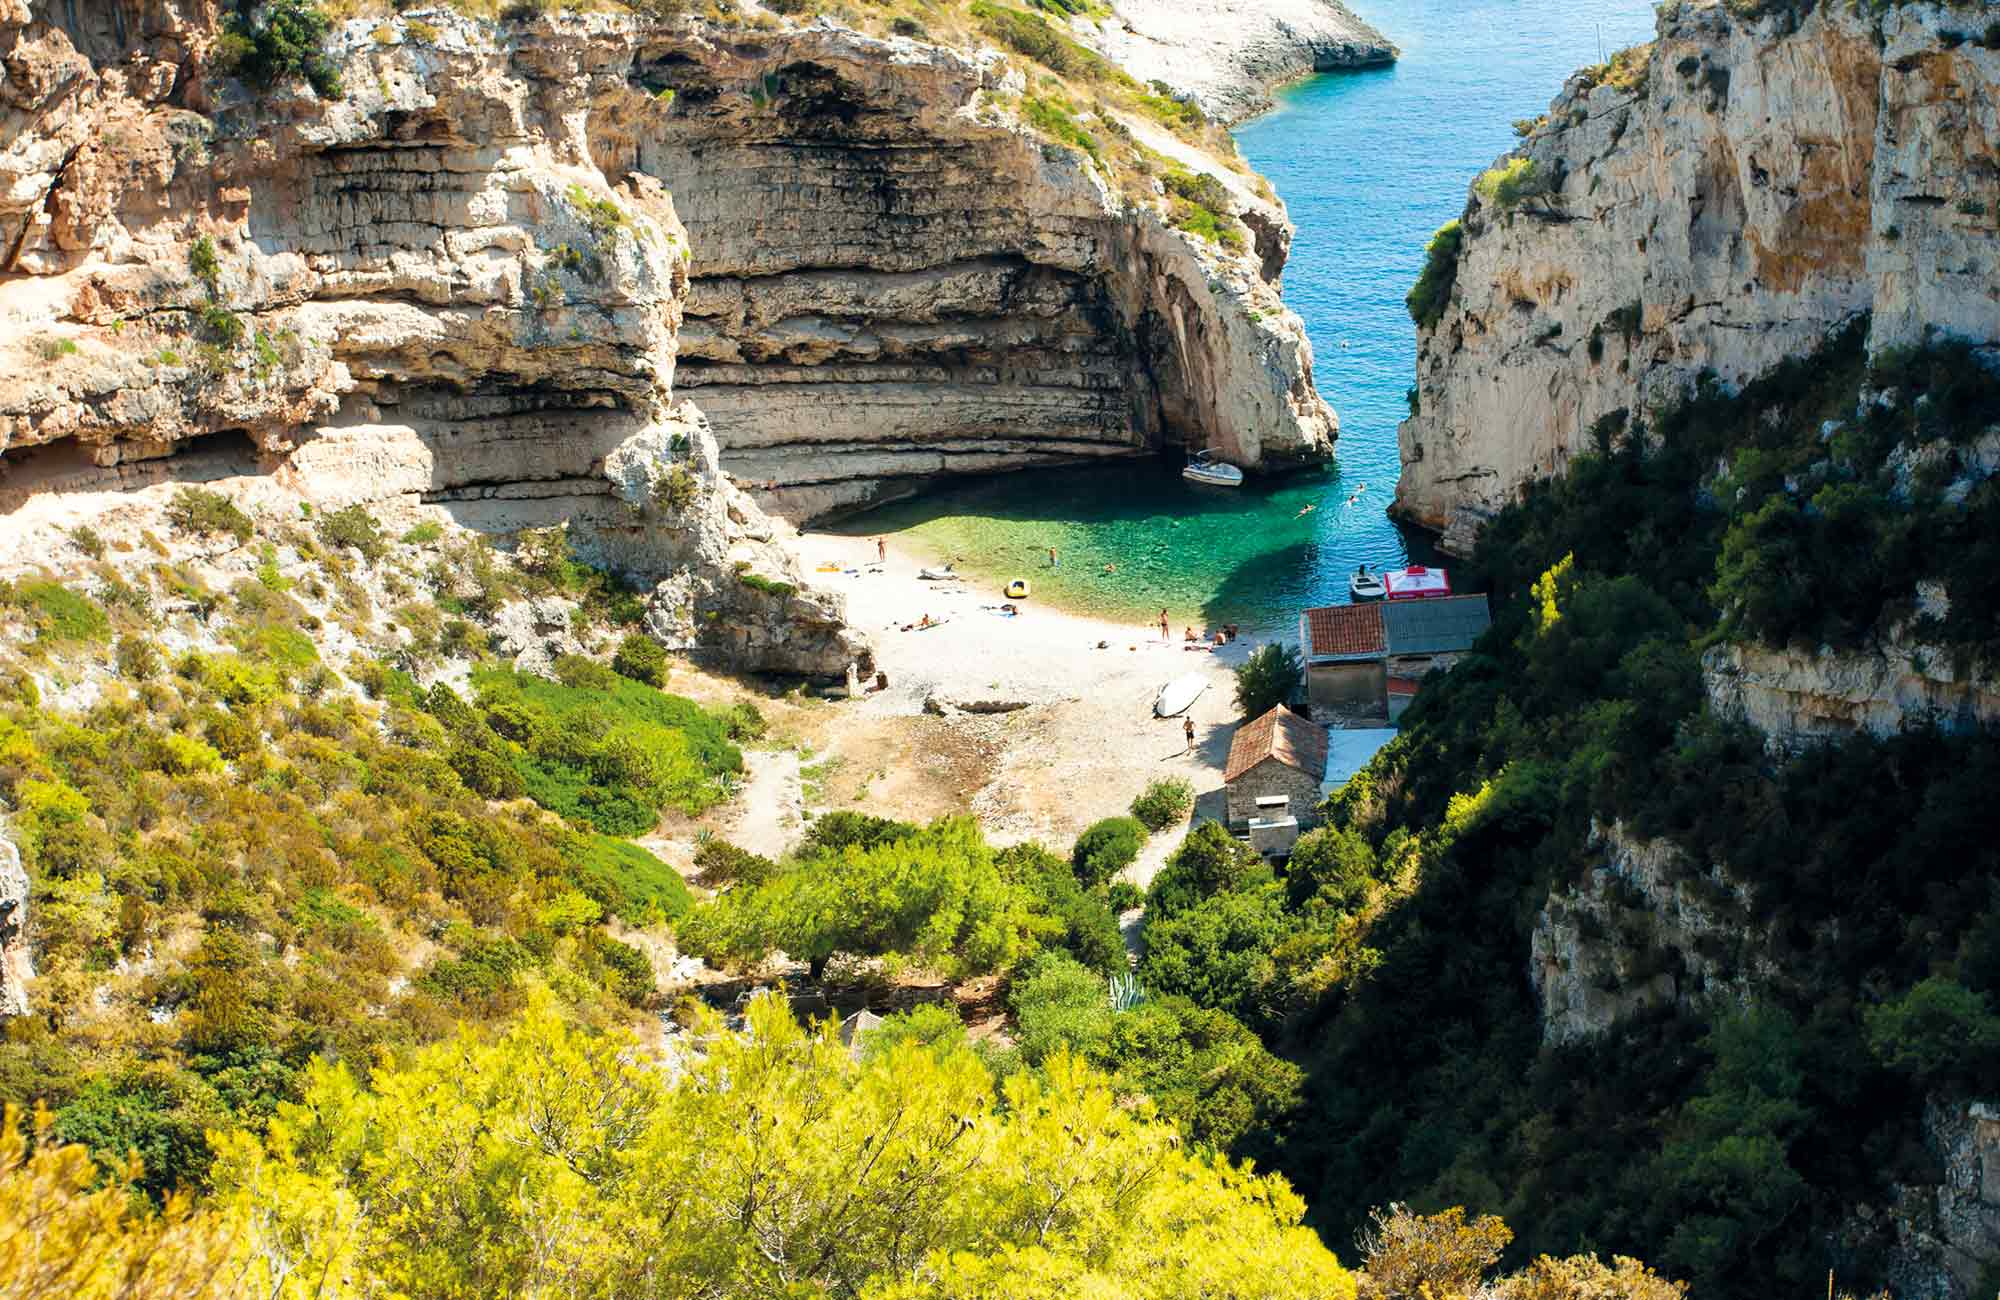 La baie de Stiniva en Croatie inspiration de Porco Rosso du studio Ghibli